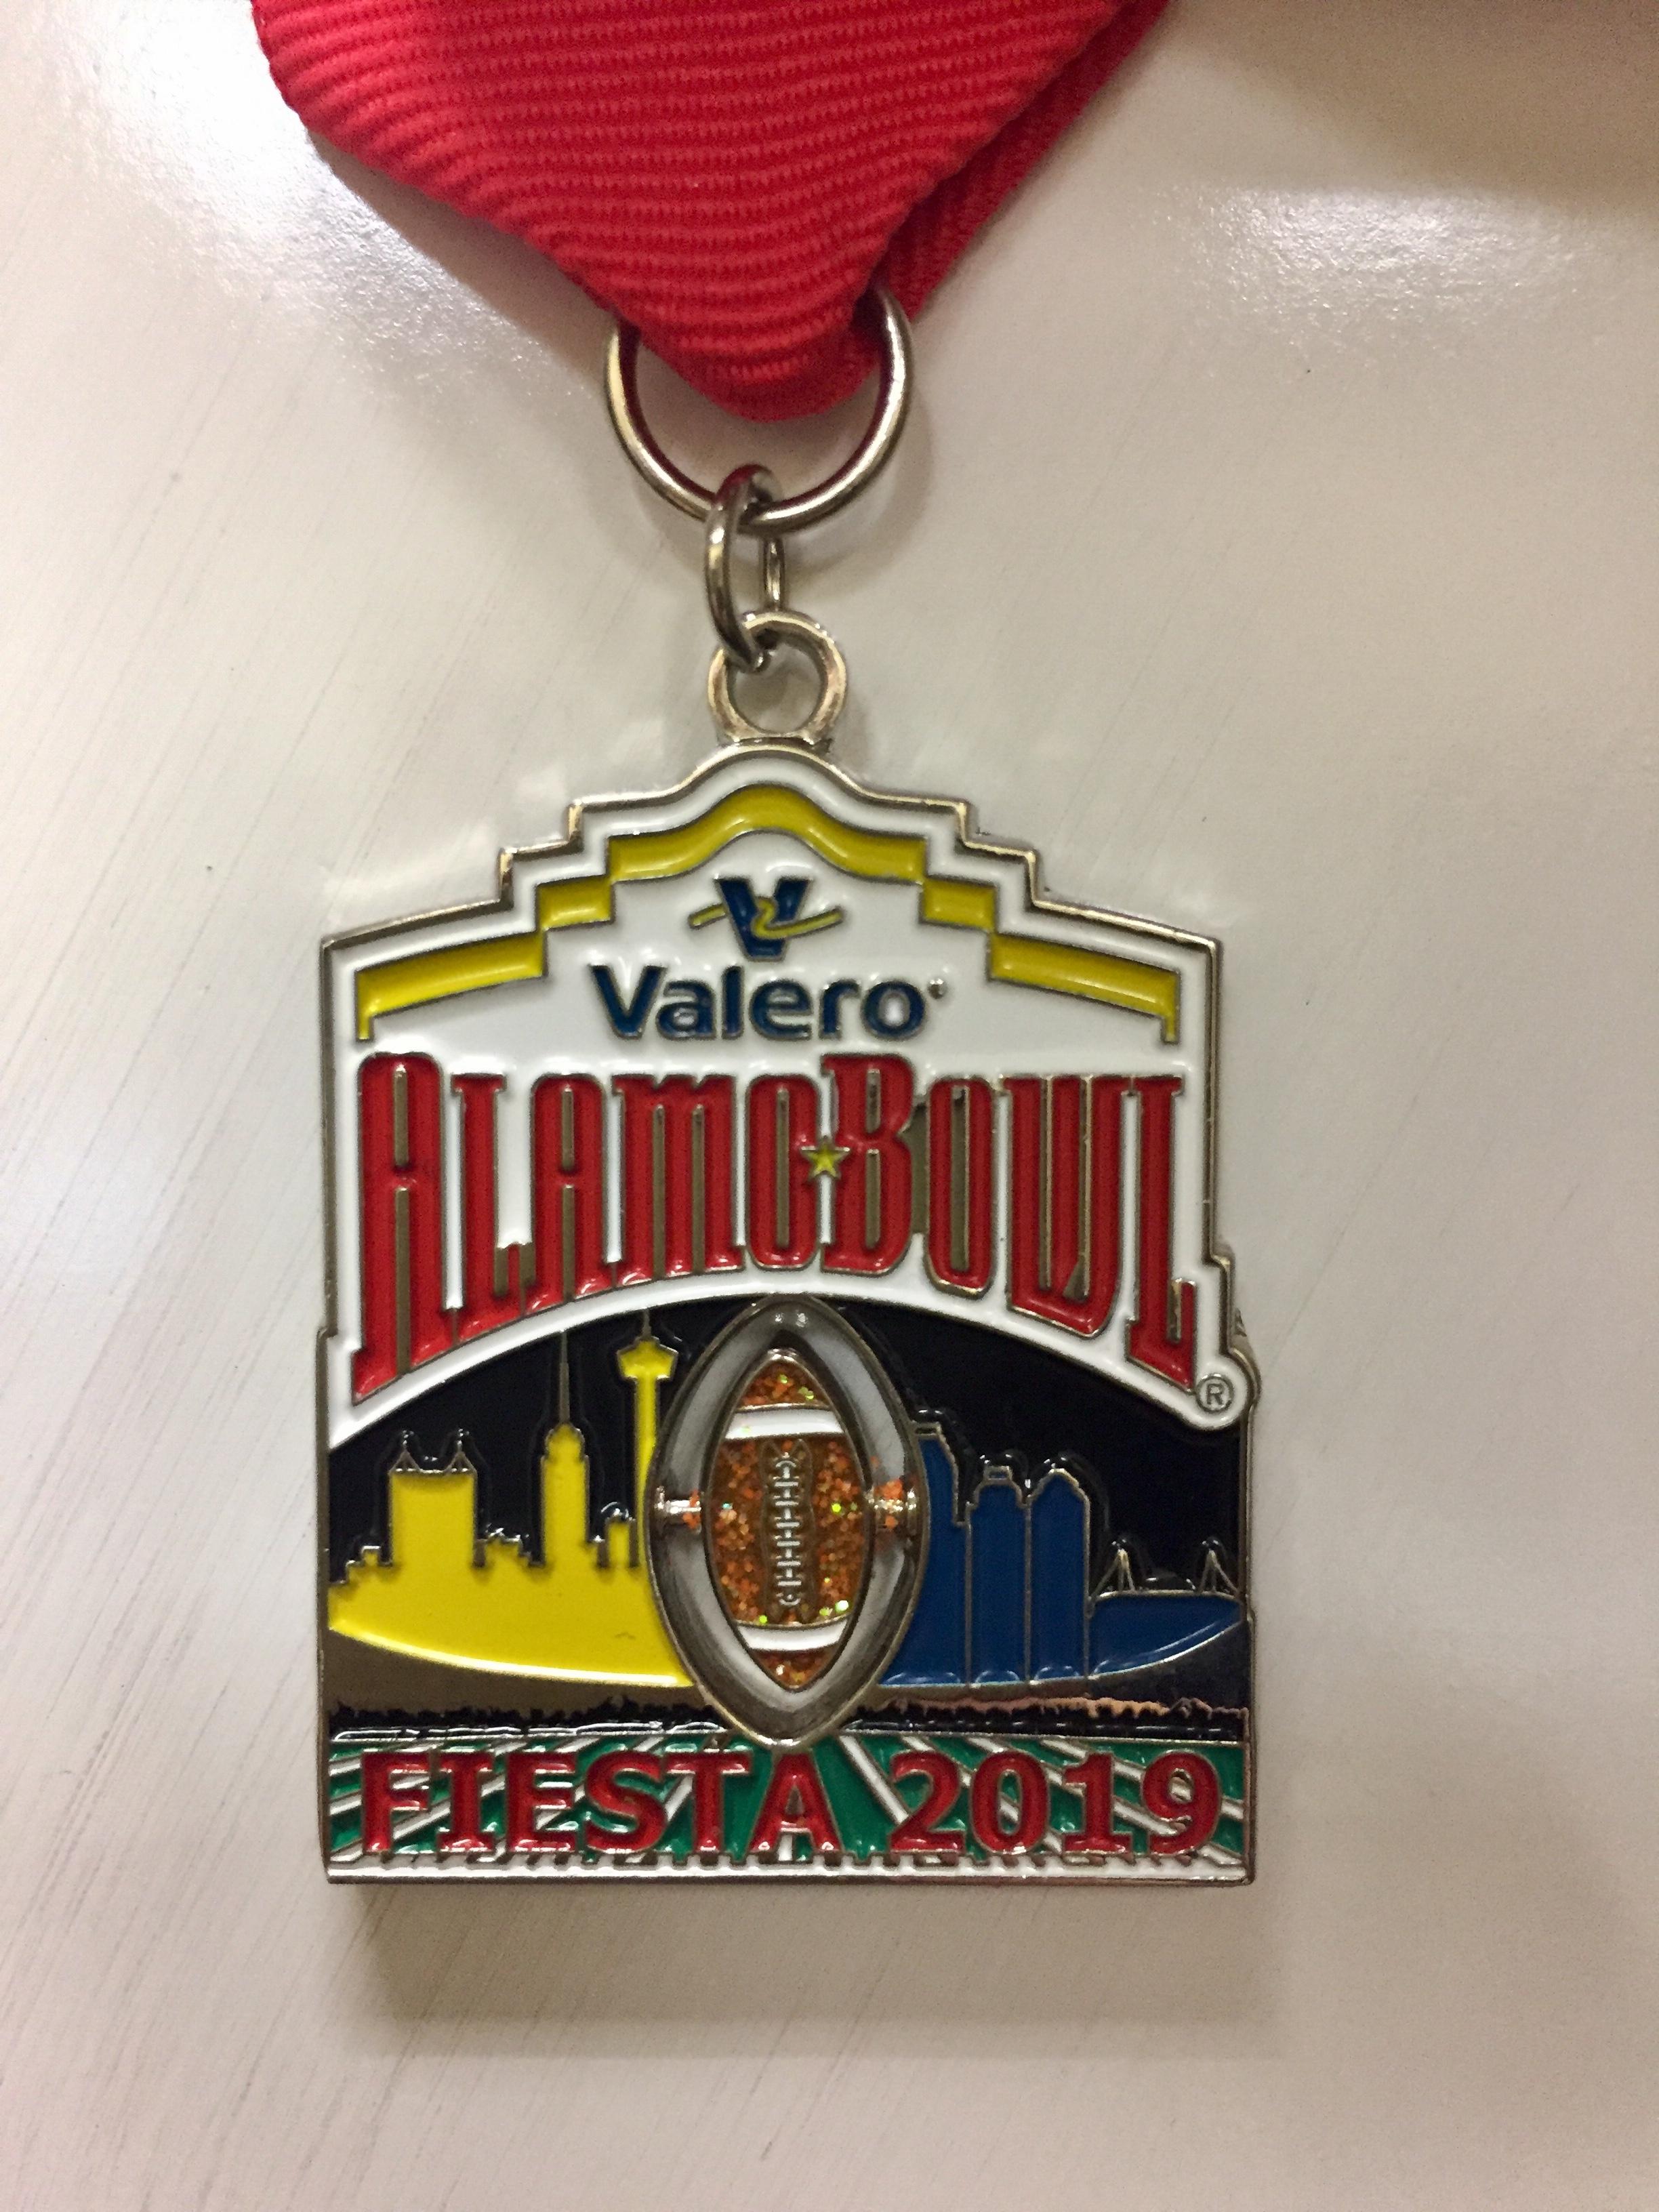 d1b2d7d976453e 2019 Fiesta Medal - Valero Alamo Bowl